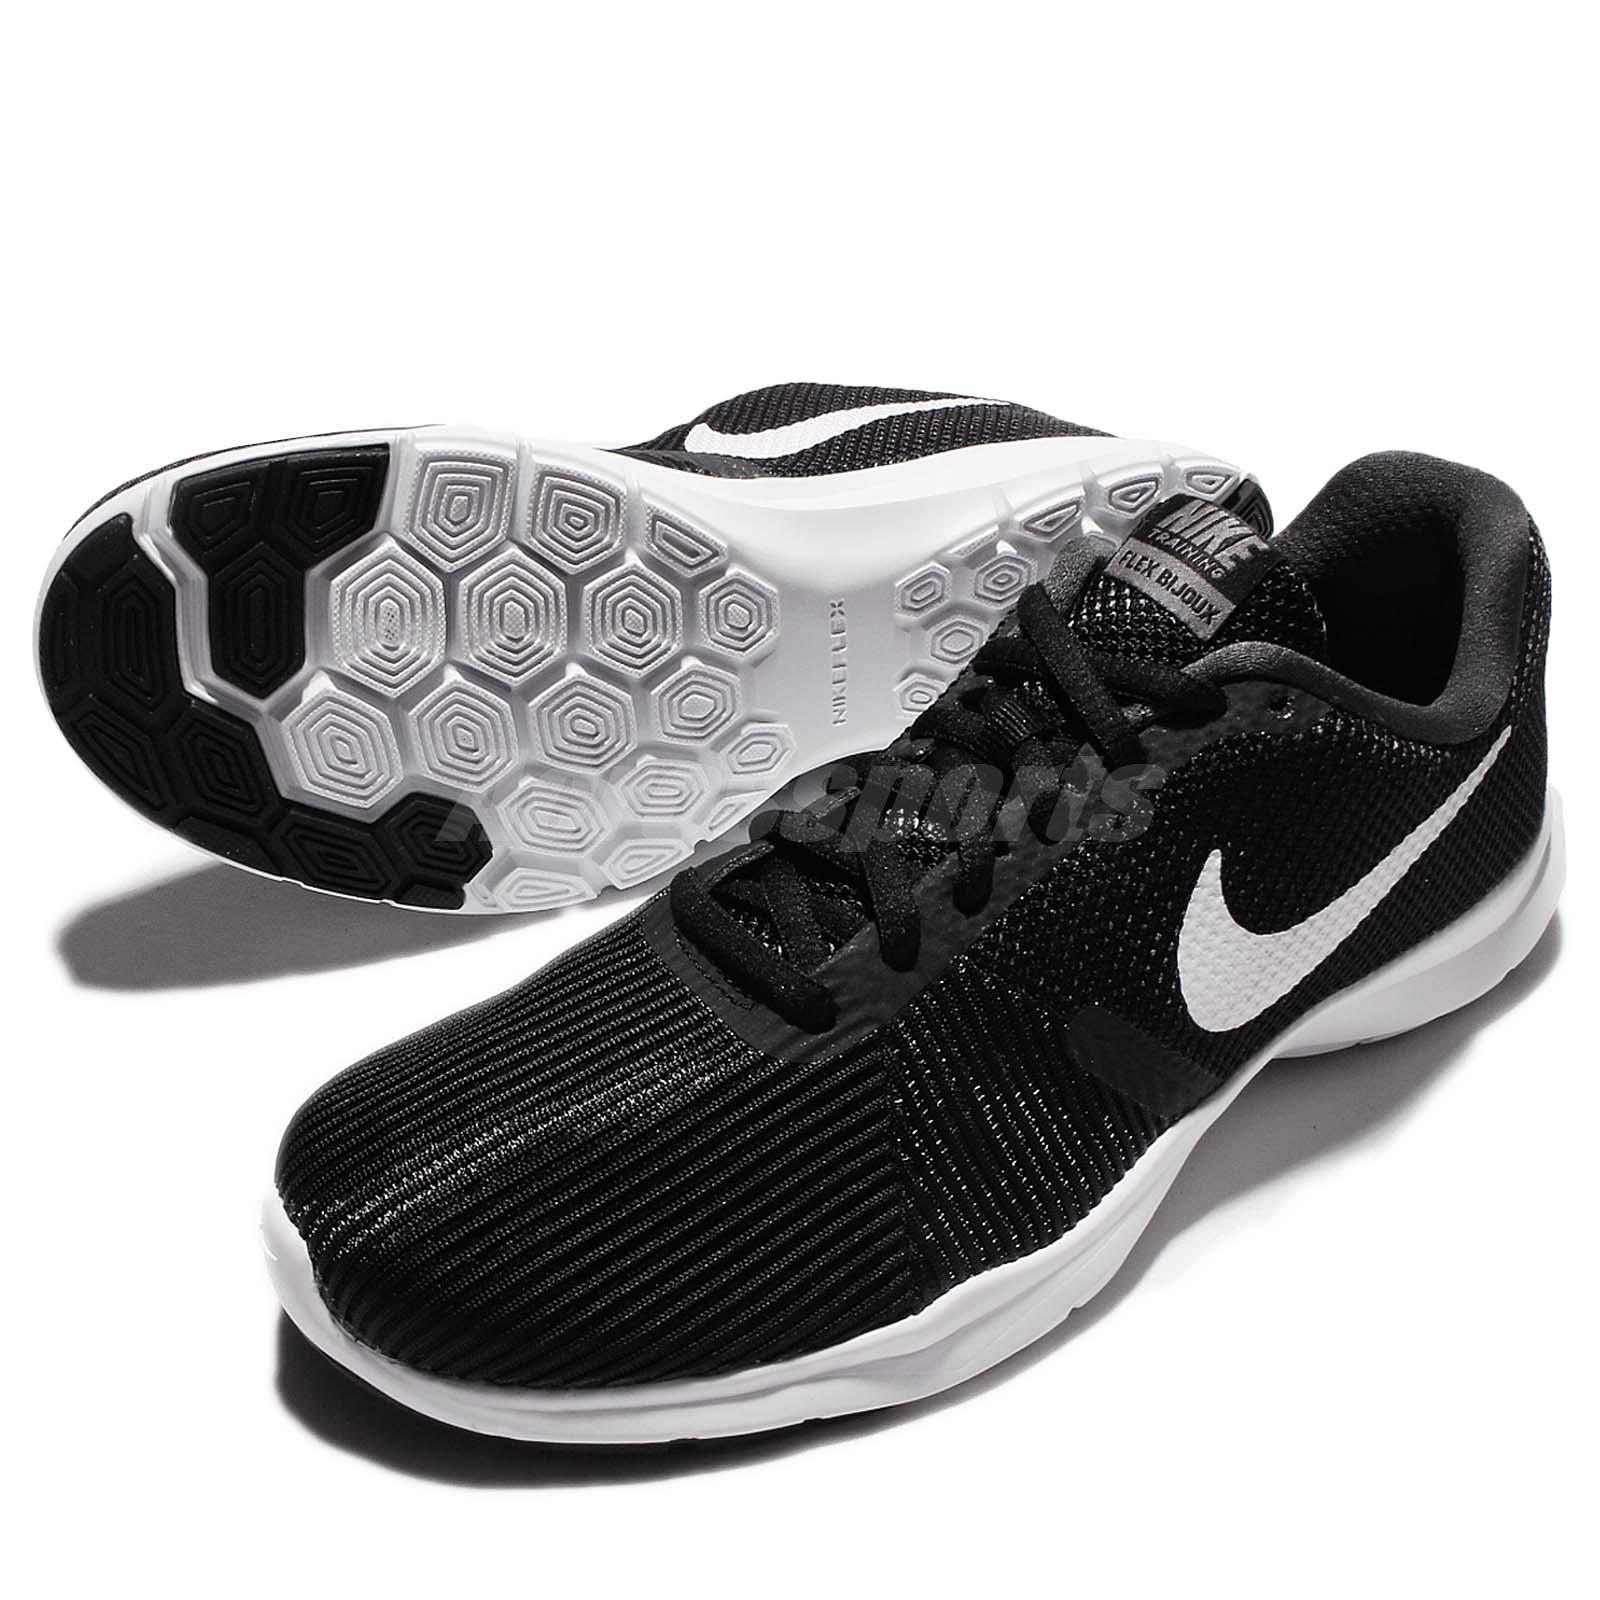 b8c879da9d4 Nike Tiempo Legacy Ag Id Shoes Luminous